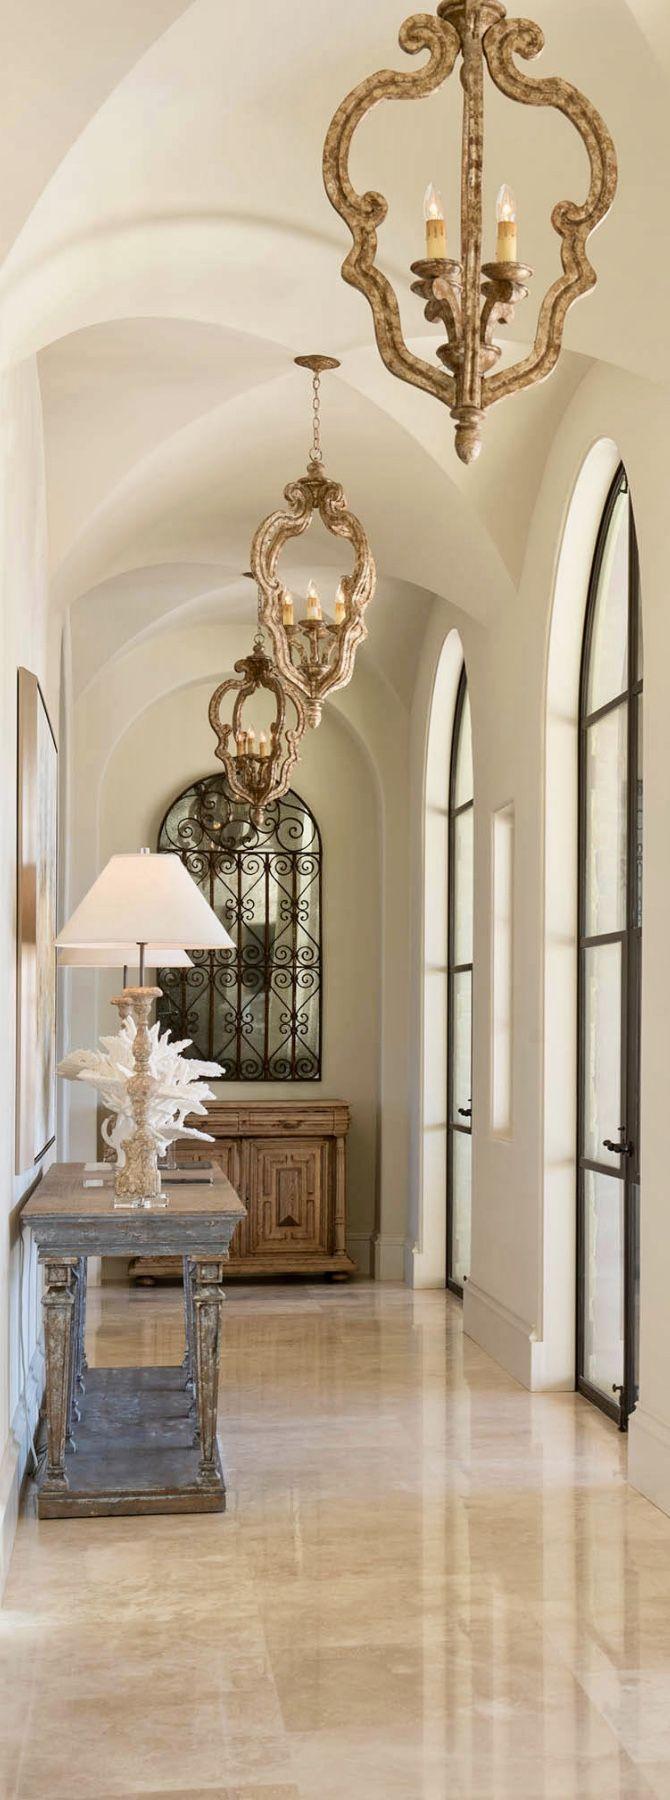 Photo of Old World, Mediterranean, Italian, Spanish & Tuscan Homes Design & Decor